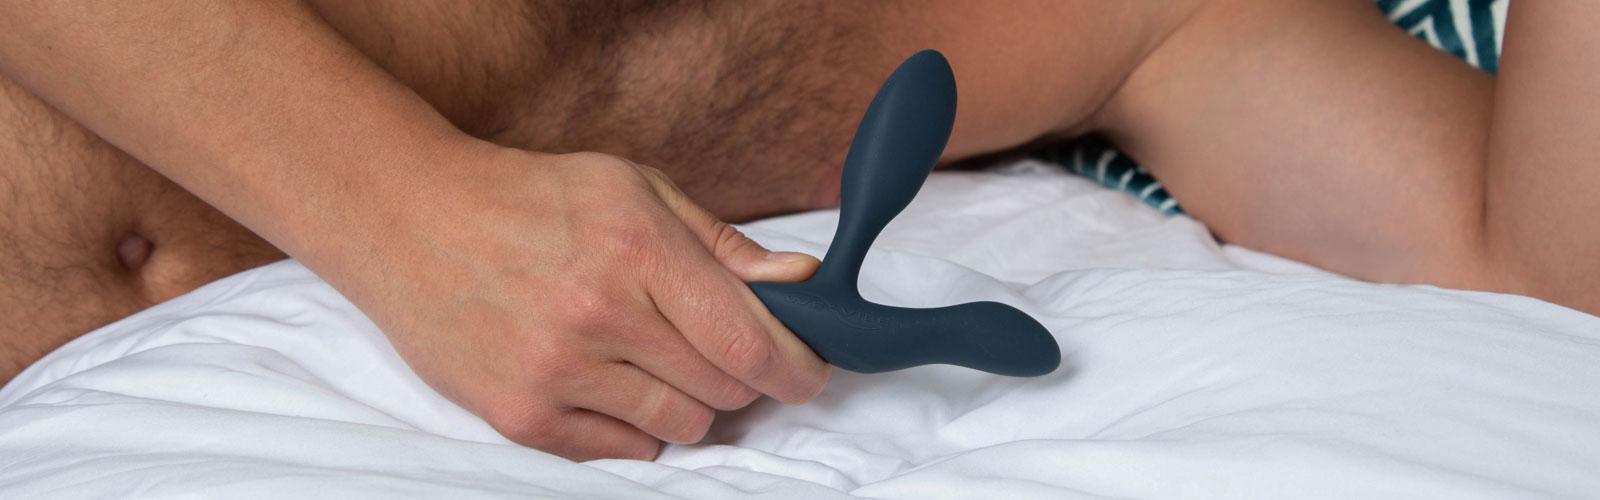 We-Vibe Vector prostate massager